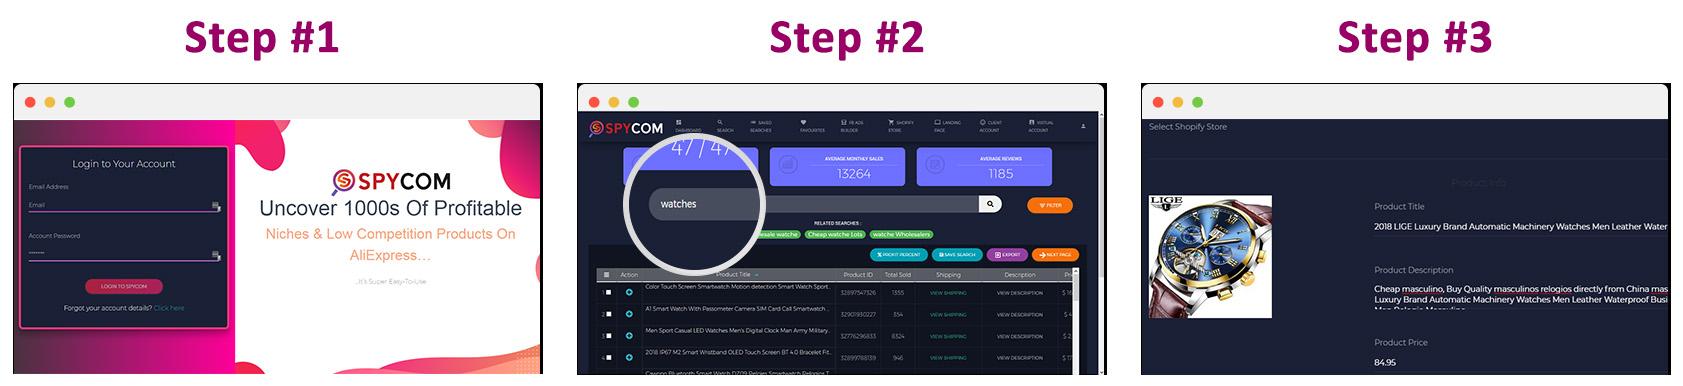 spycom-steps